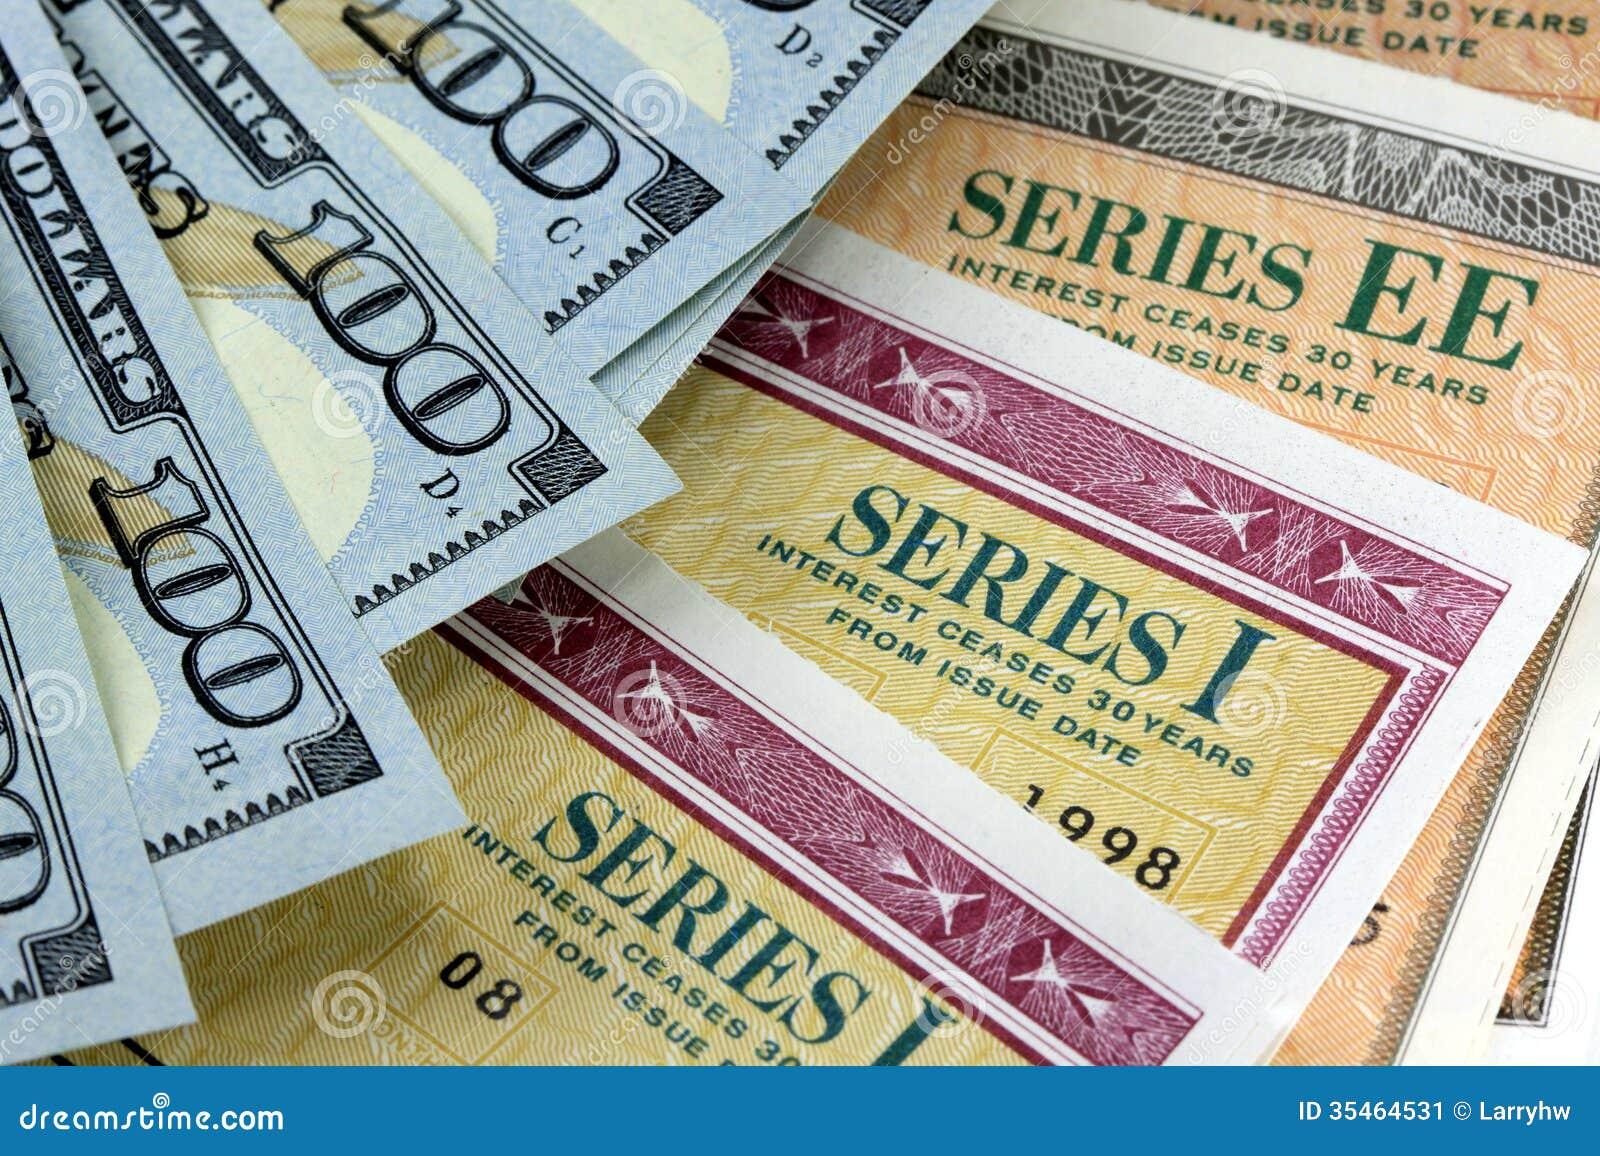 SECgov  Saving Bonds